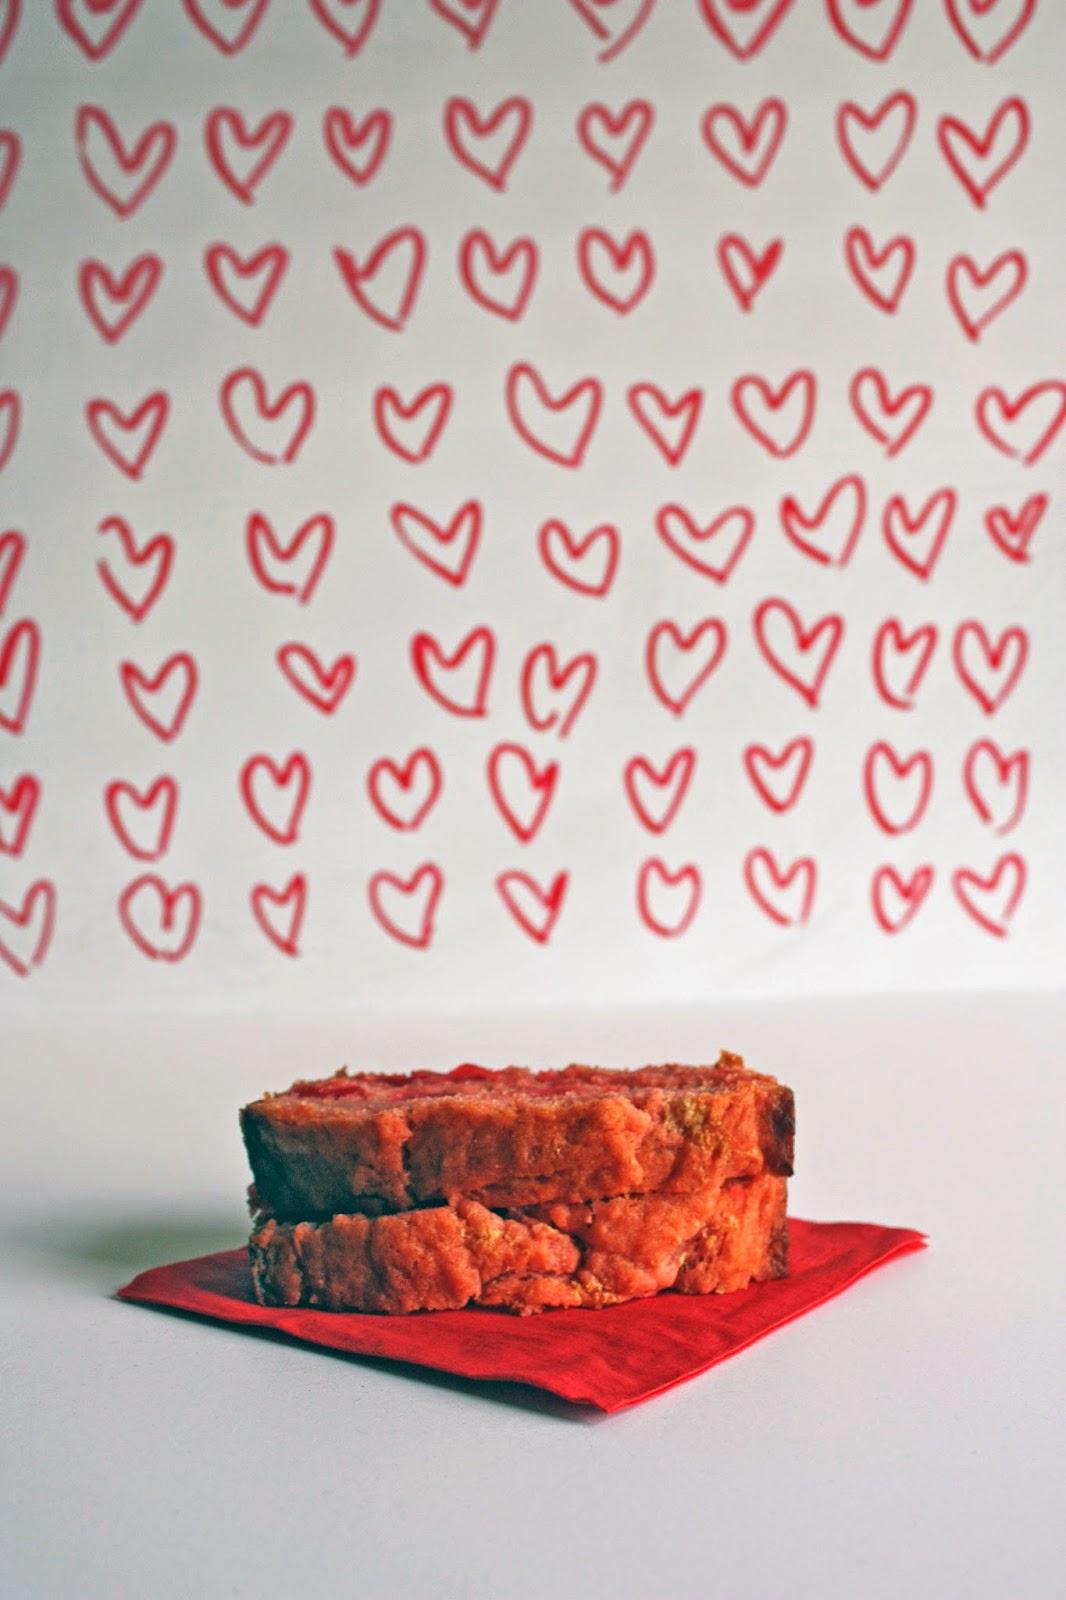 hearts vegan maraschino cherry quick bread red napkin